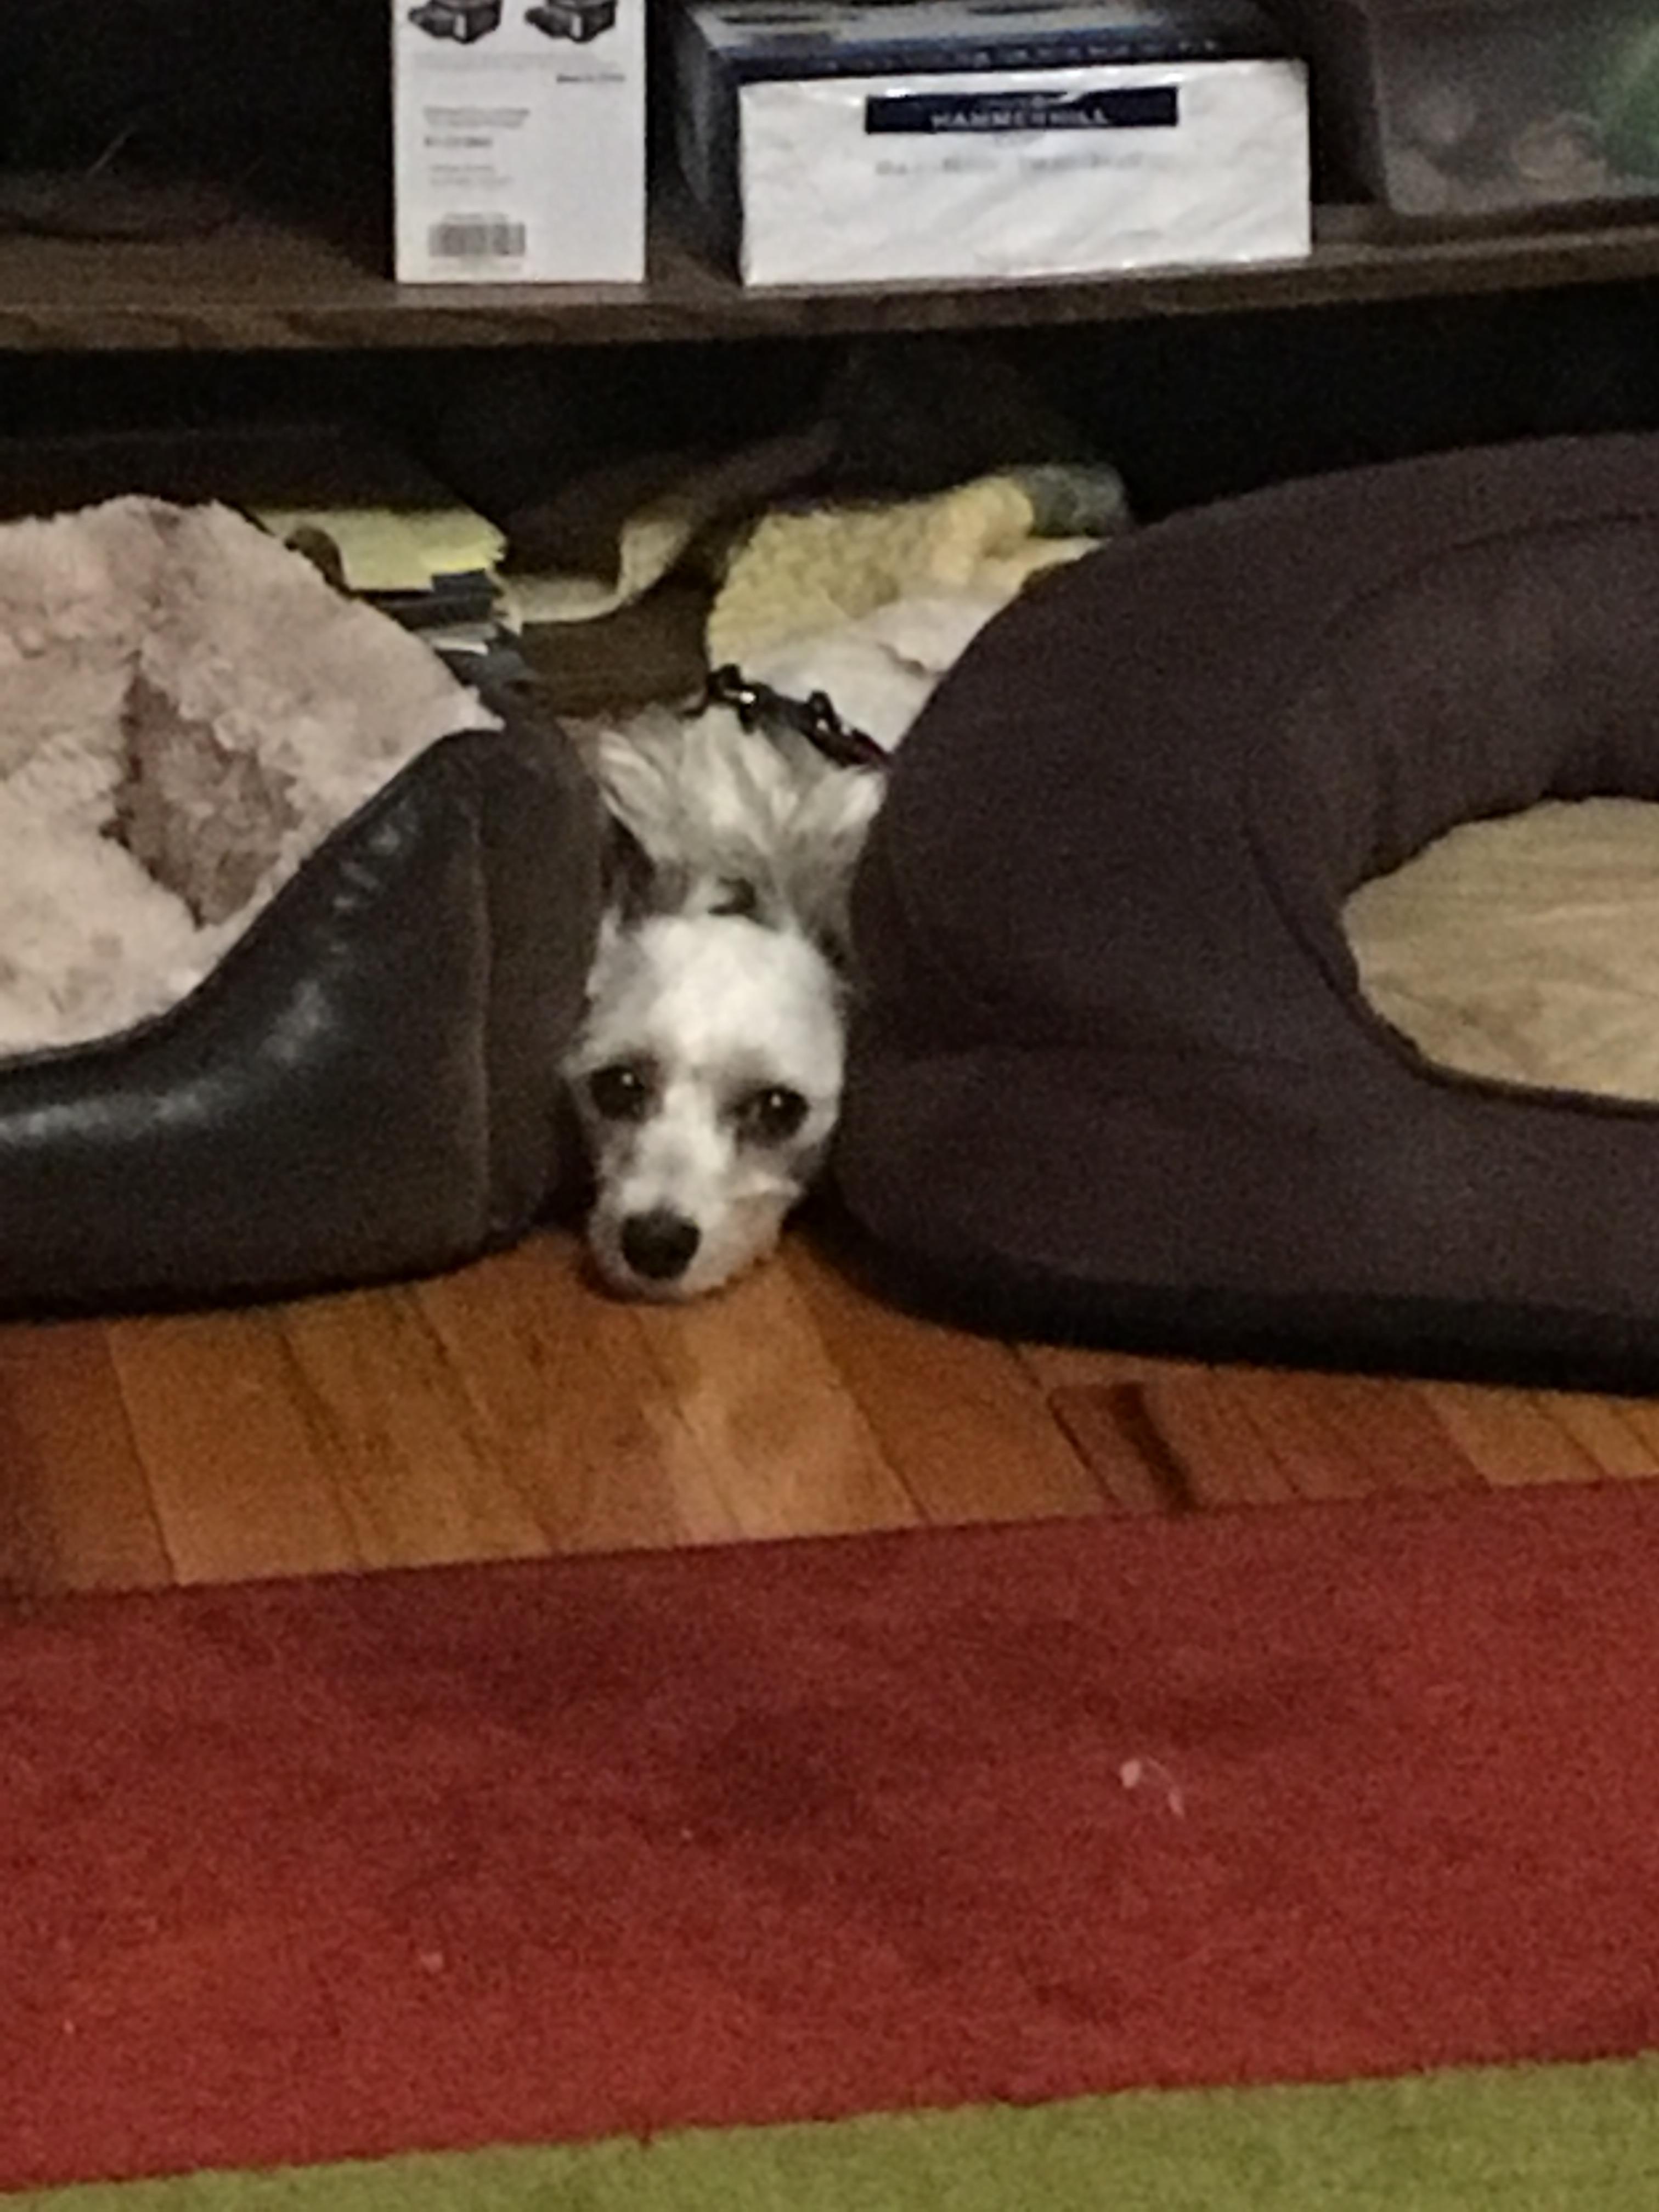 Ellie between two beds